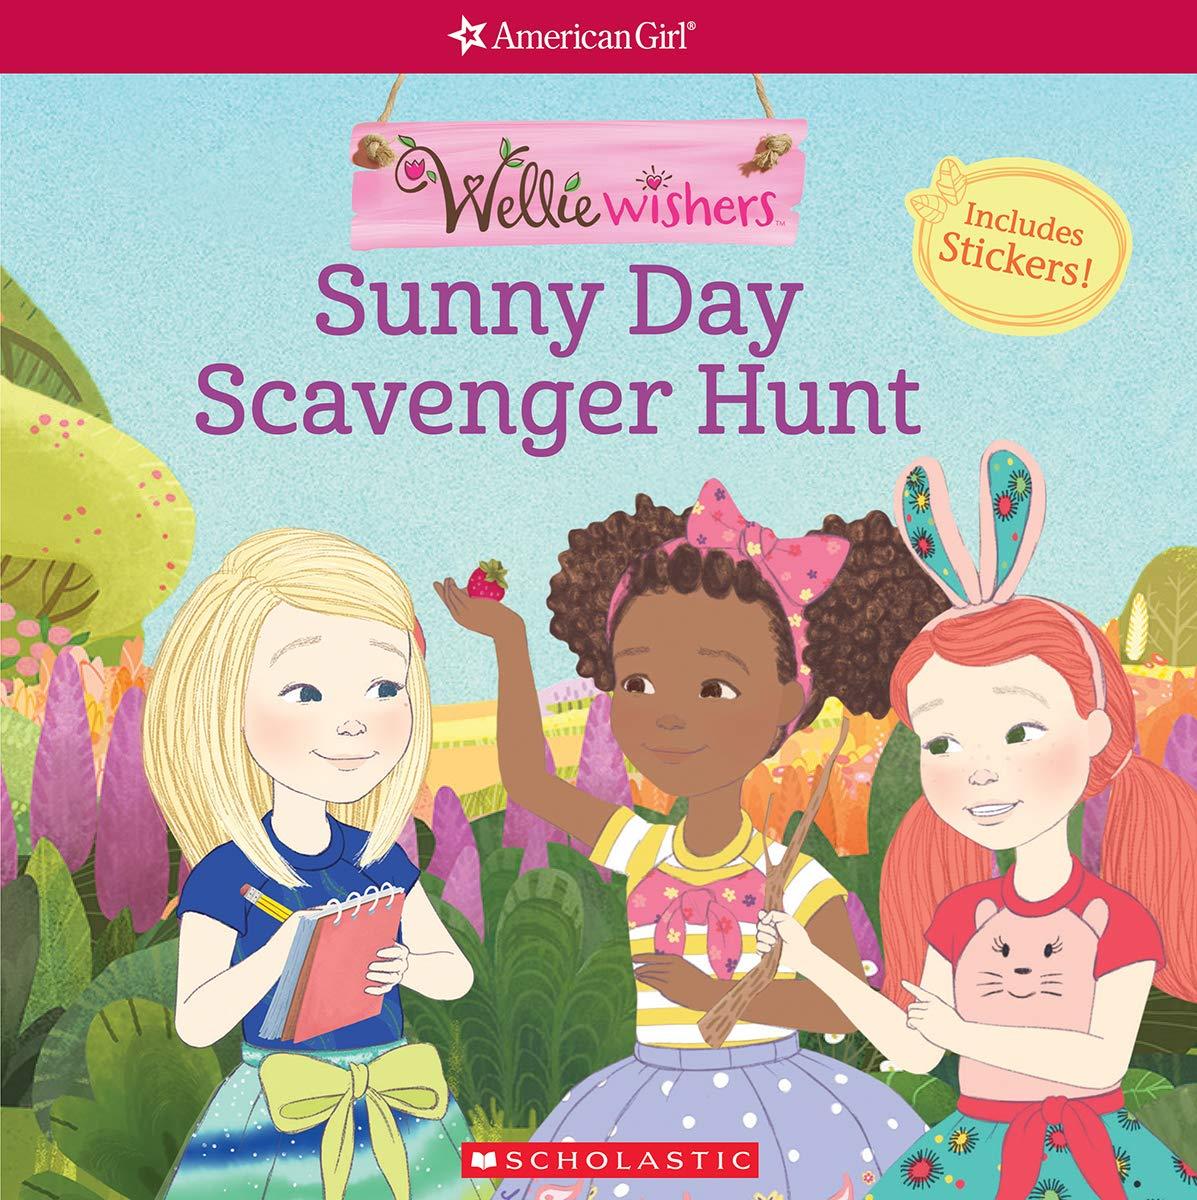 Sunny Day Scavenger Hunt (American Girl: WellieWishers) ebook